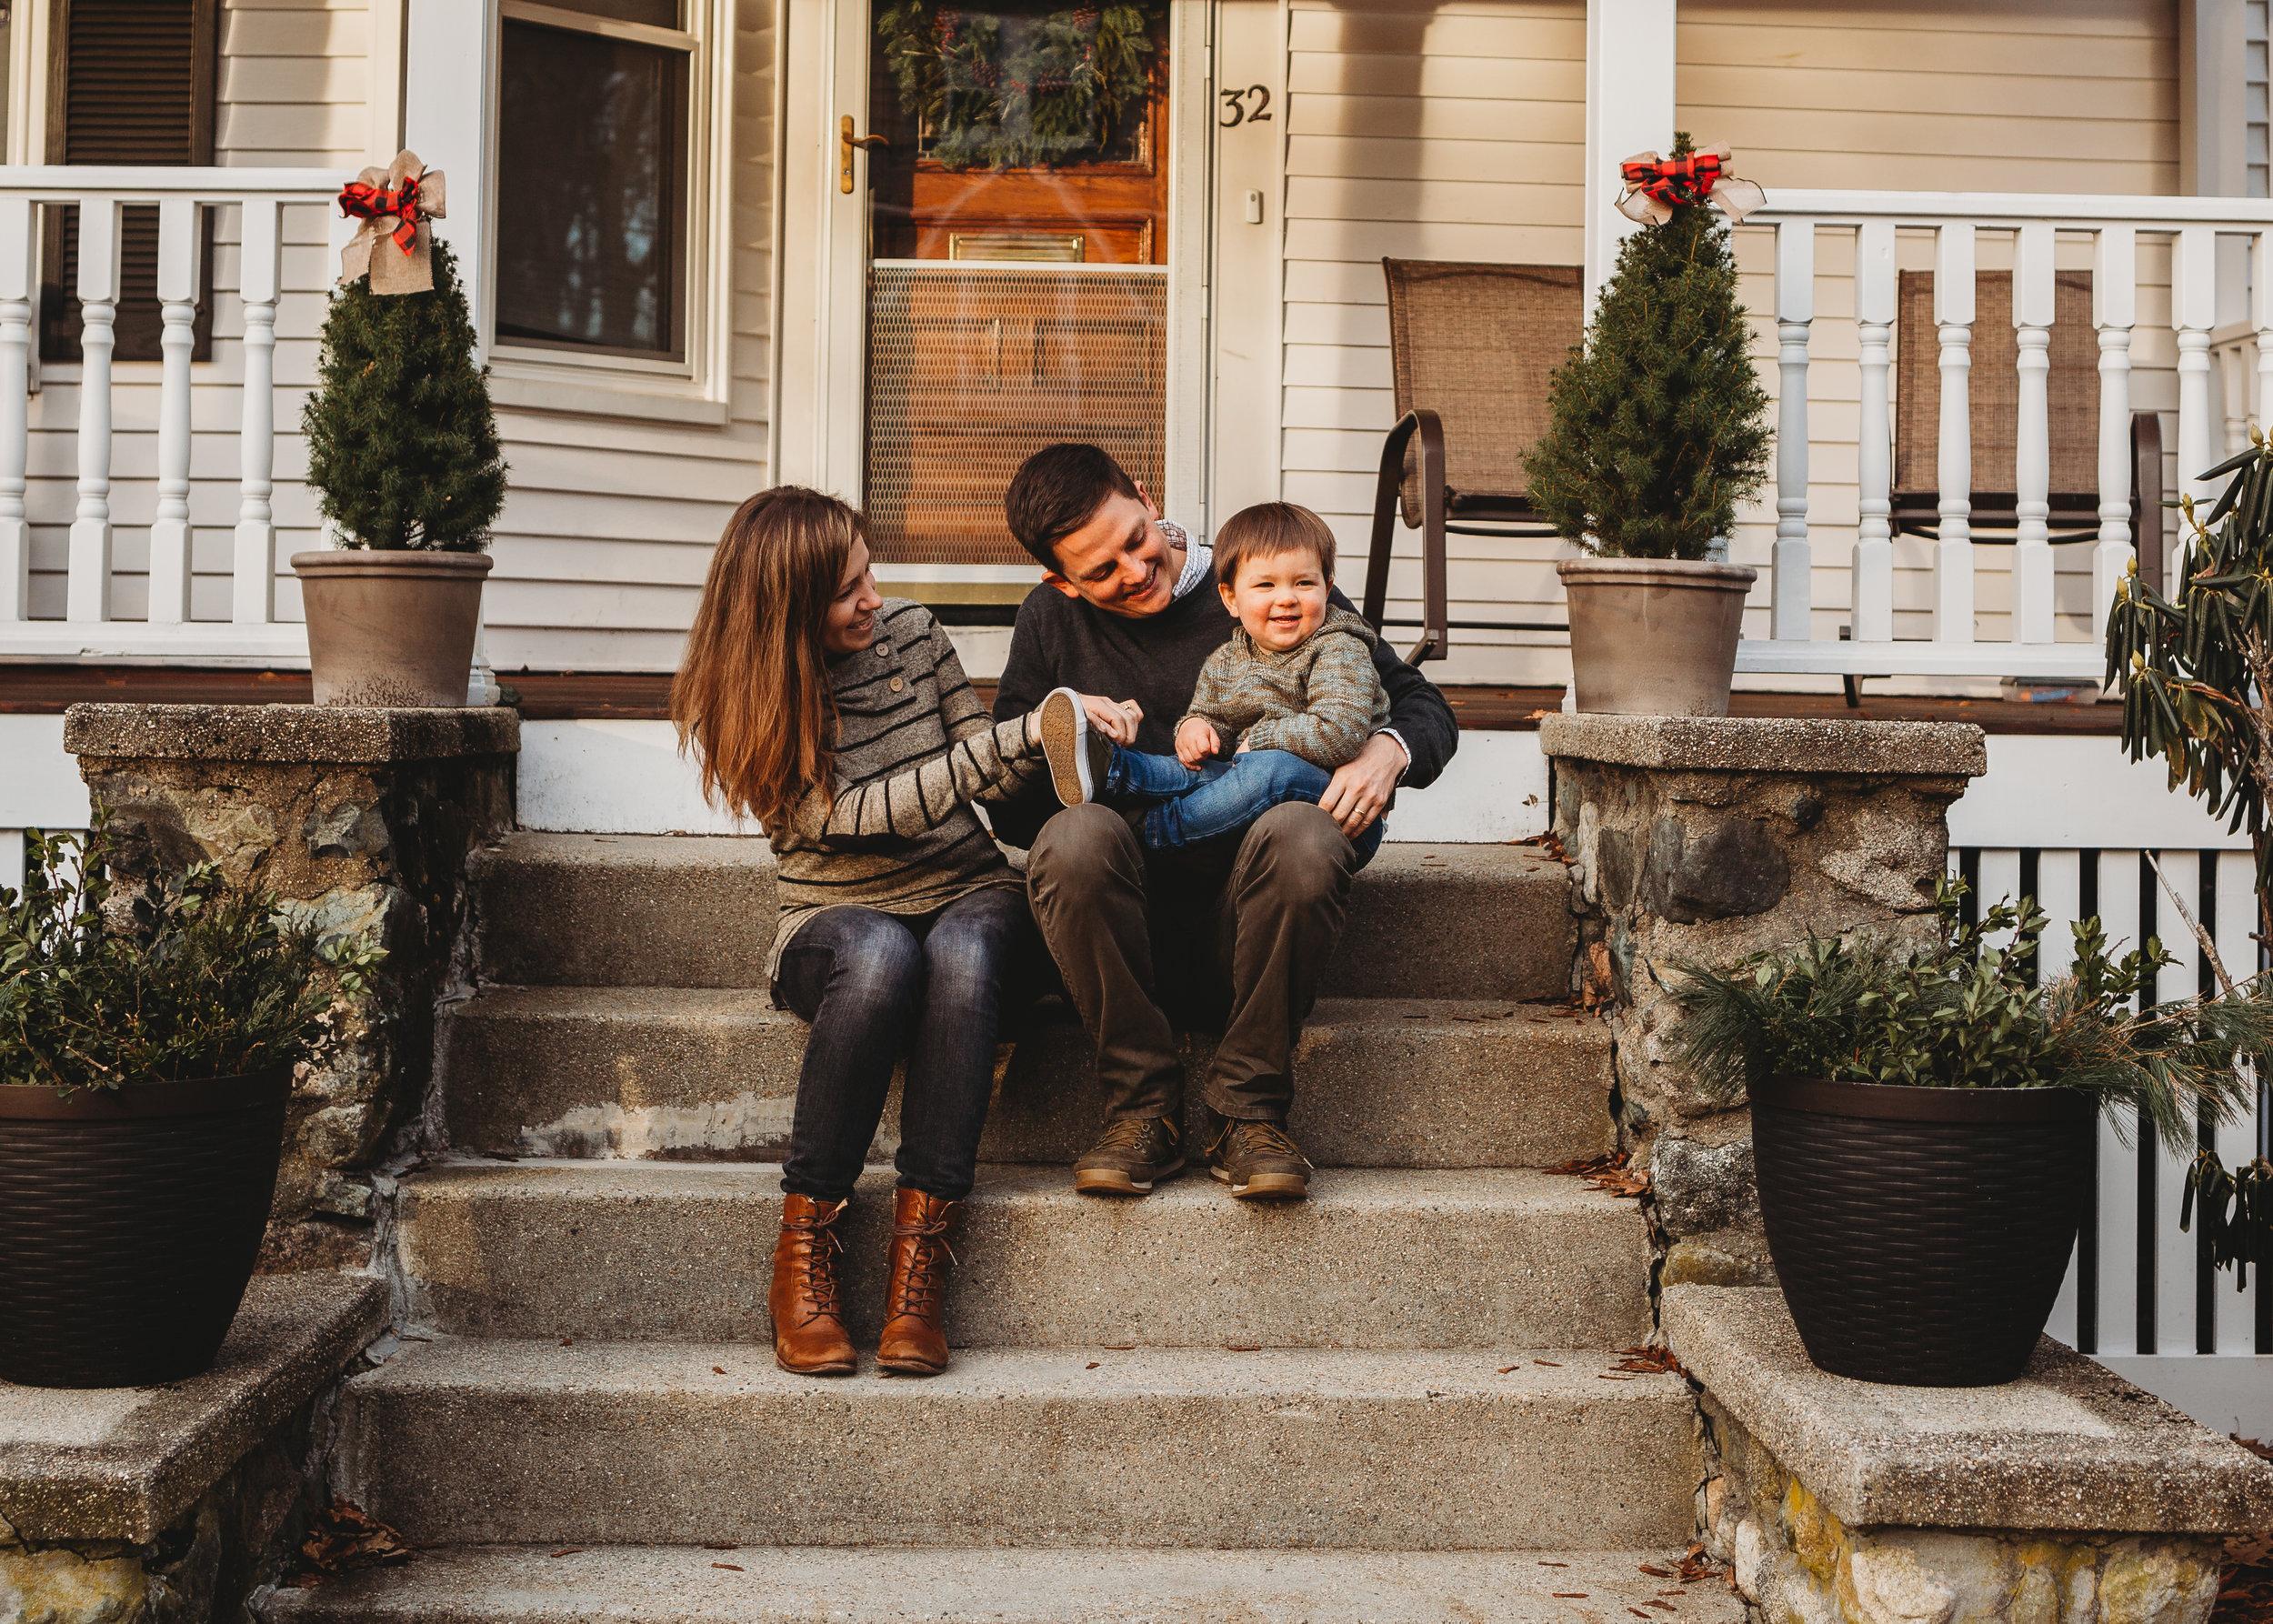 A Melrose, Massachusetts family sitting on the front steps of their home. Boston family photographer Joy LeDuc.